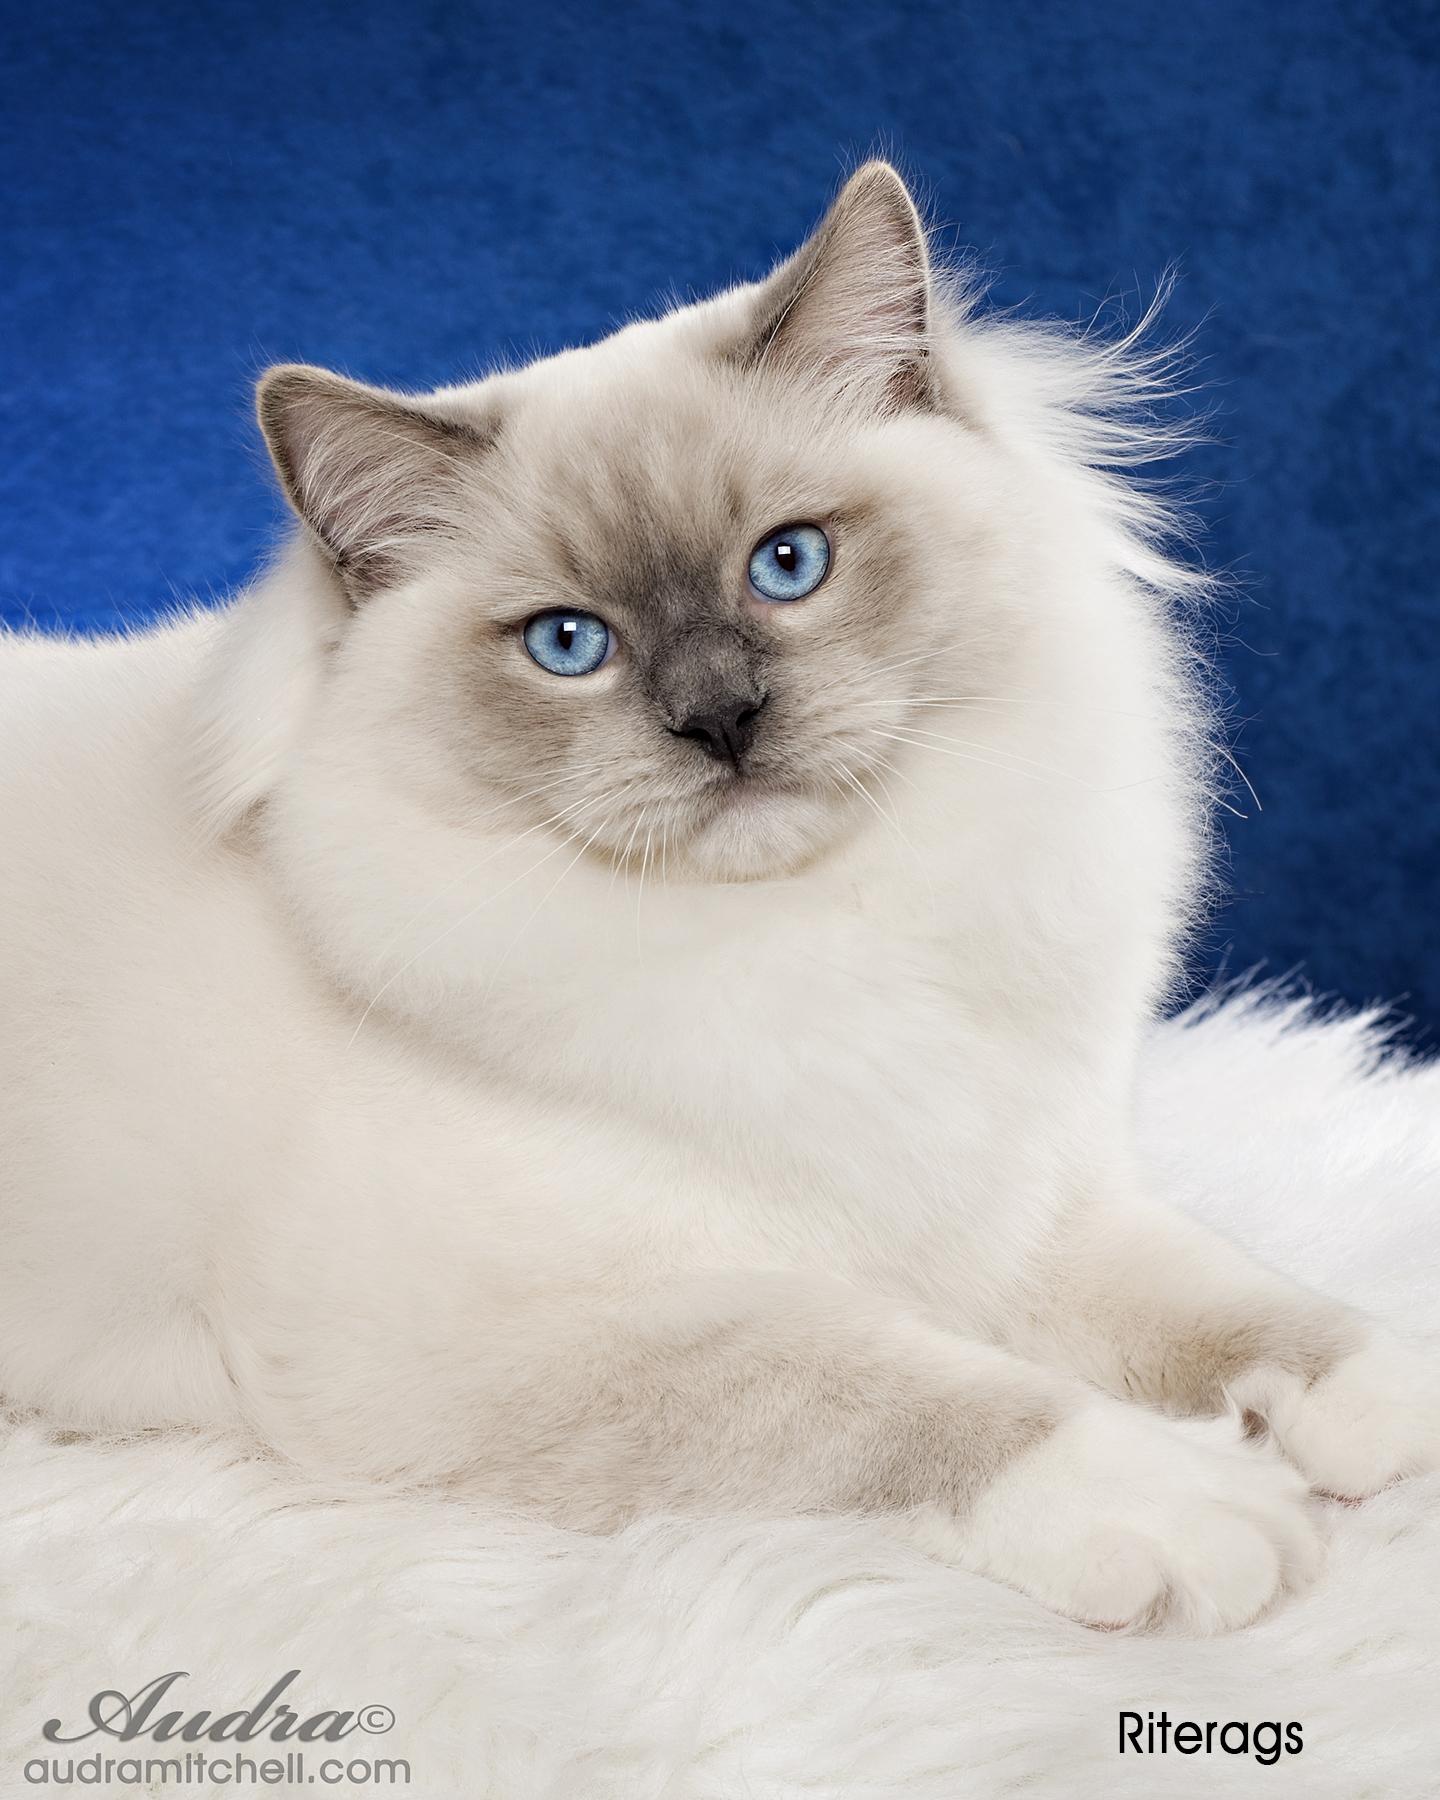 Purebred Adult Male Ragdoll Cats For Sale  Riterags Ragdolls